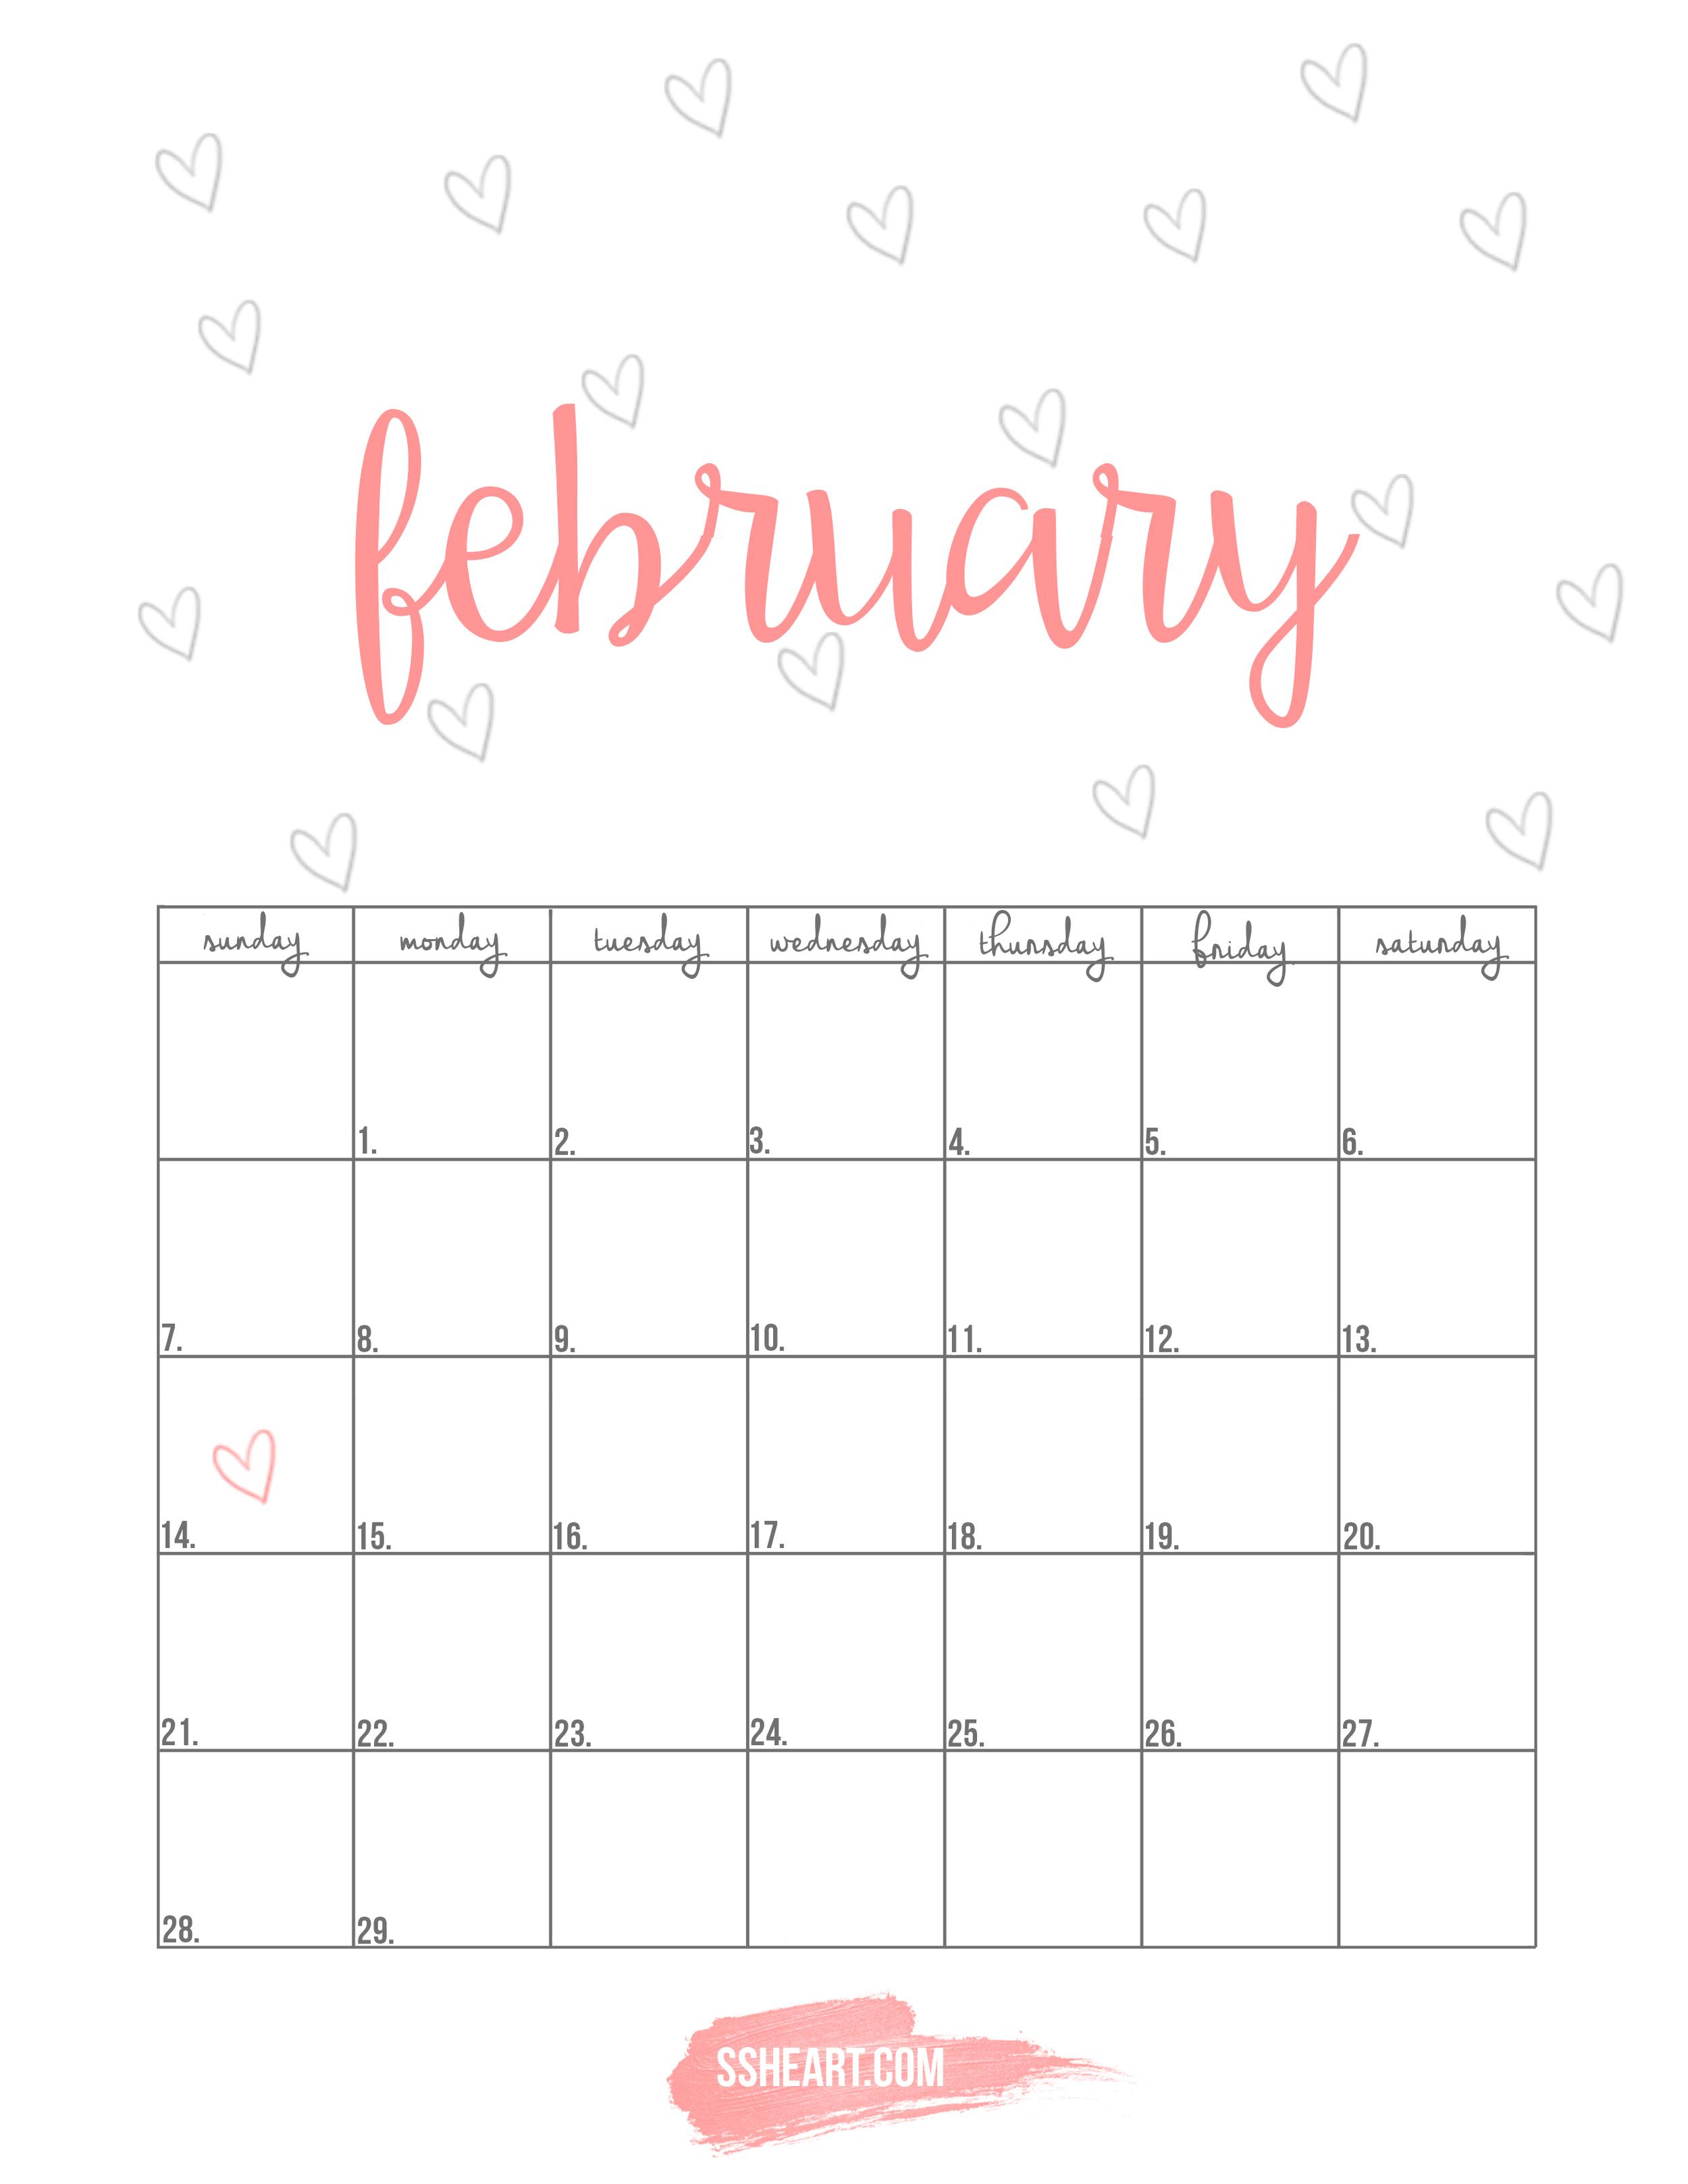 Free printable February calendar!